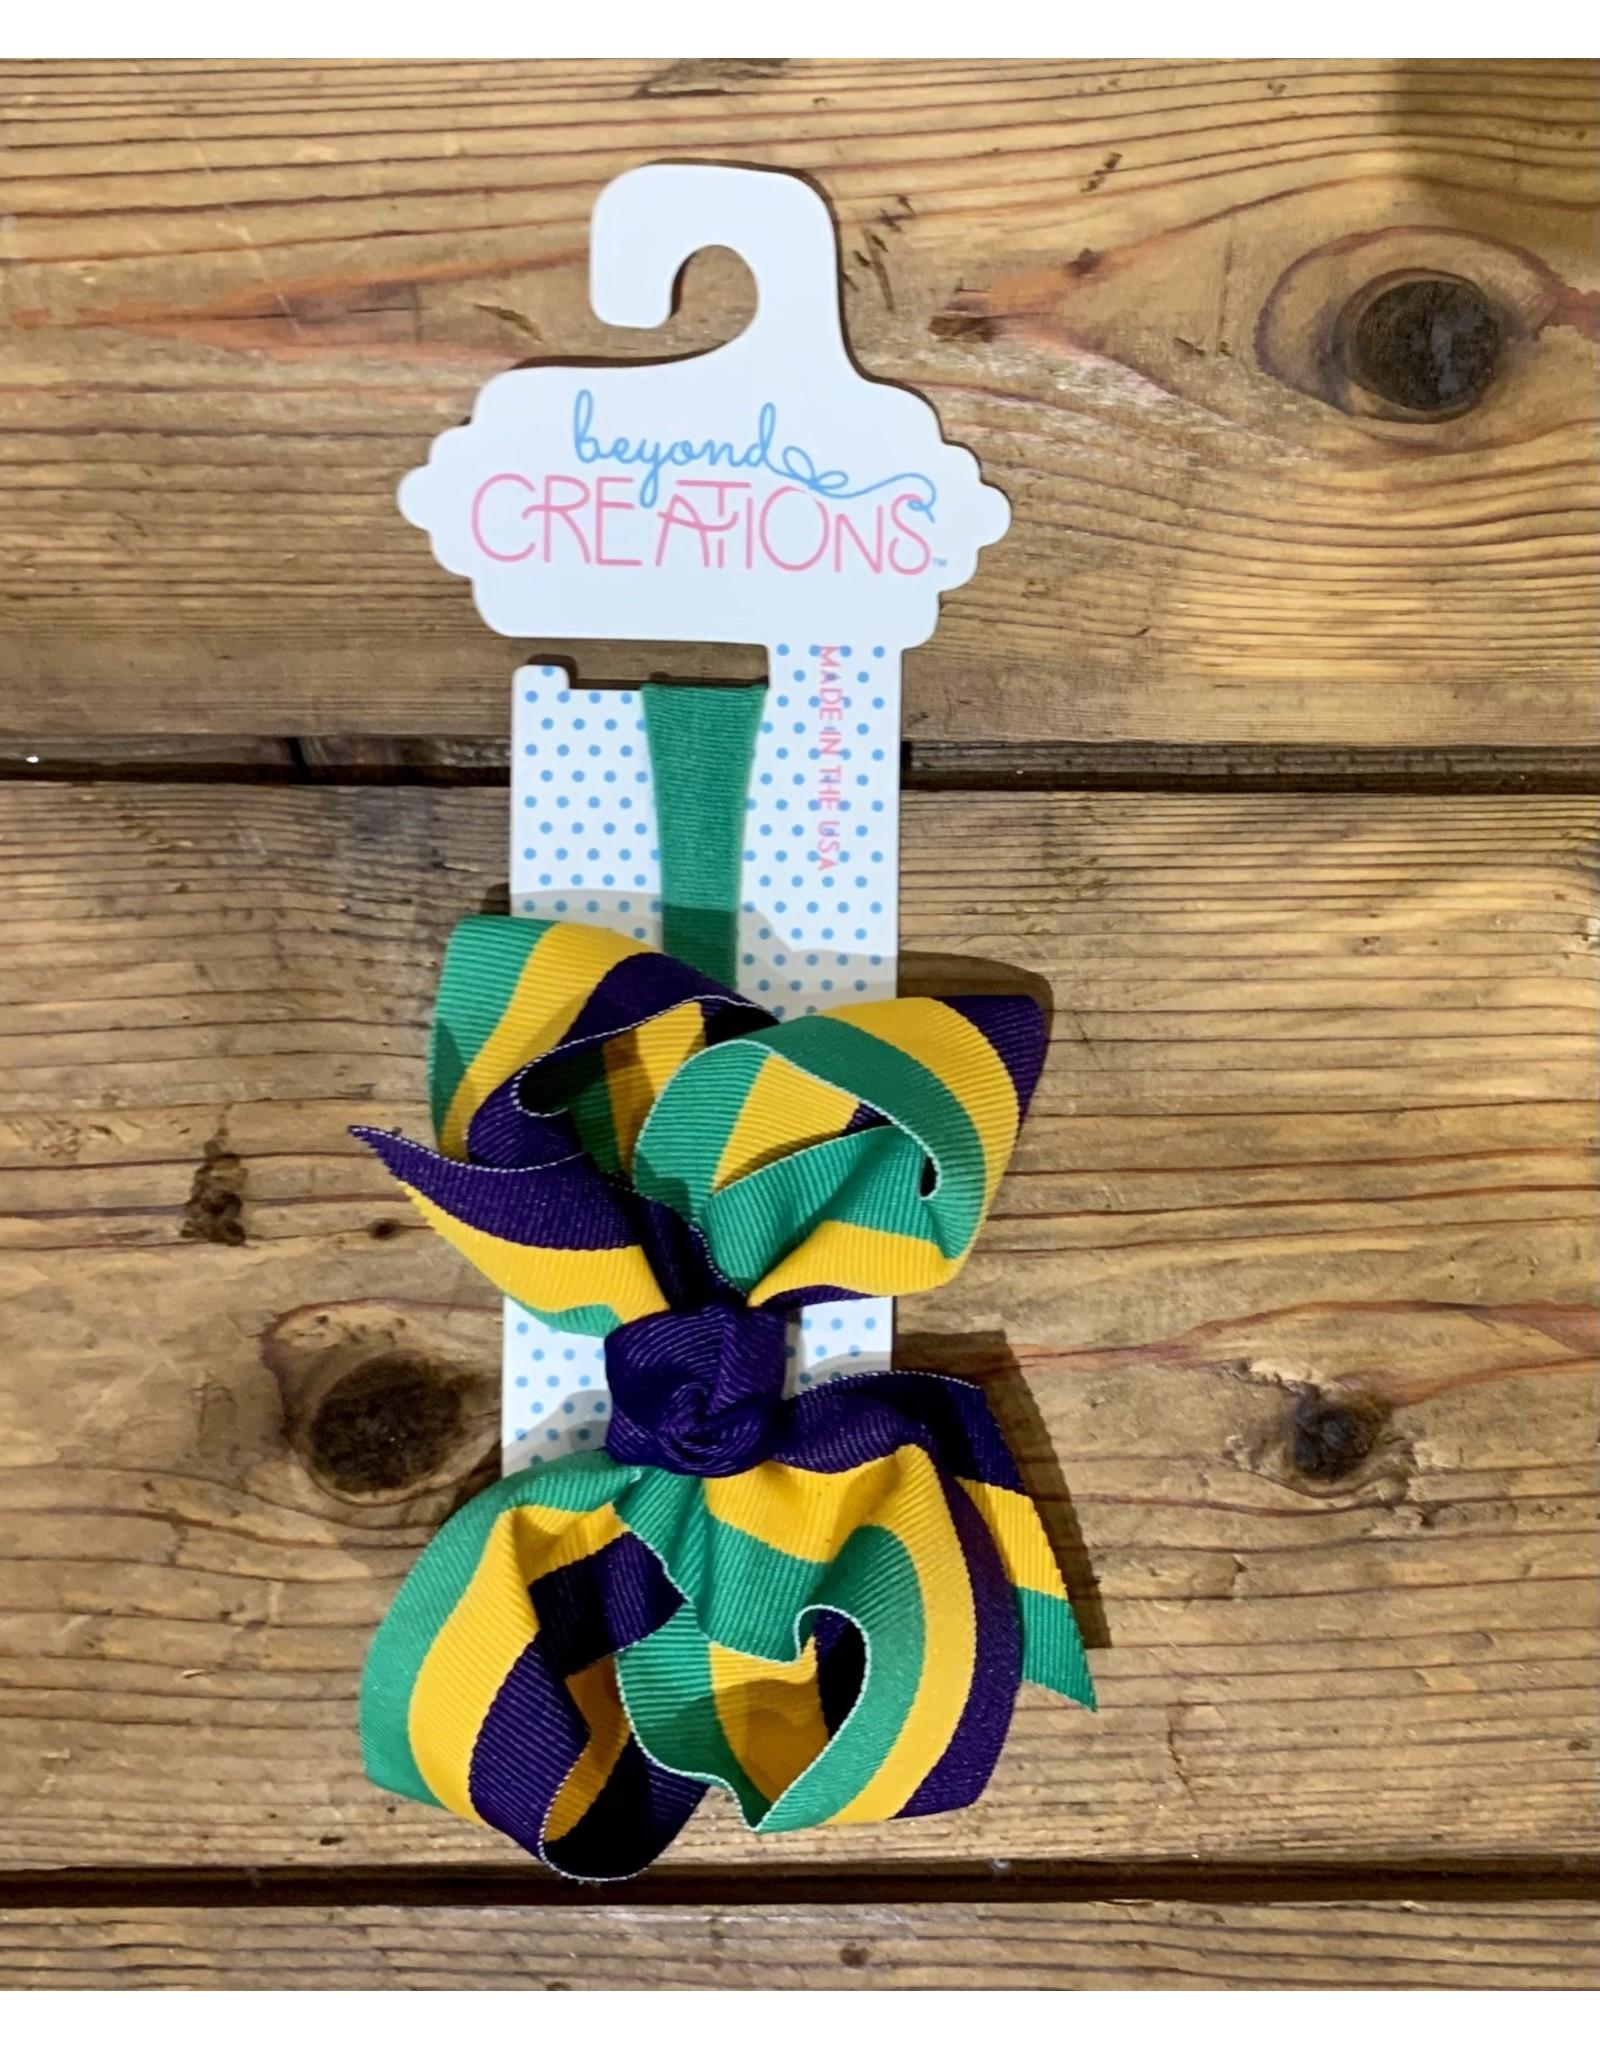 "Beyond Creations Beyond Creations- 4.5"" Lg. Stripe Mardi Gras Knot Bow on 1/4"" Headband"